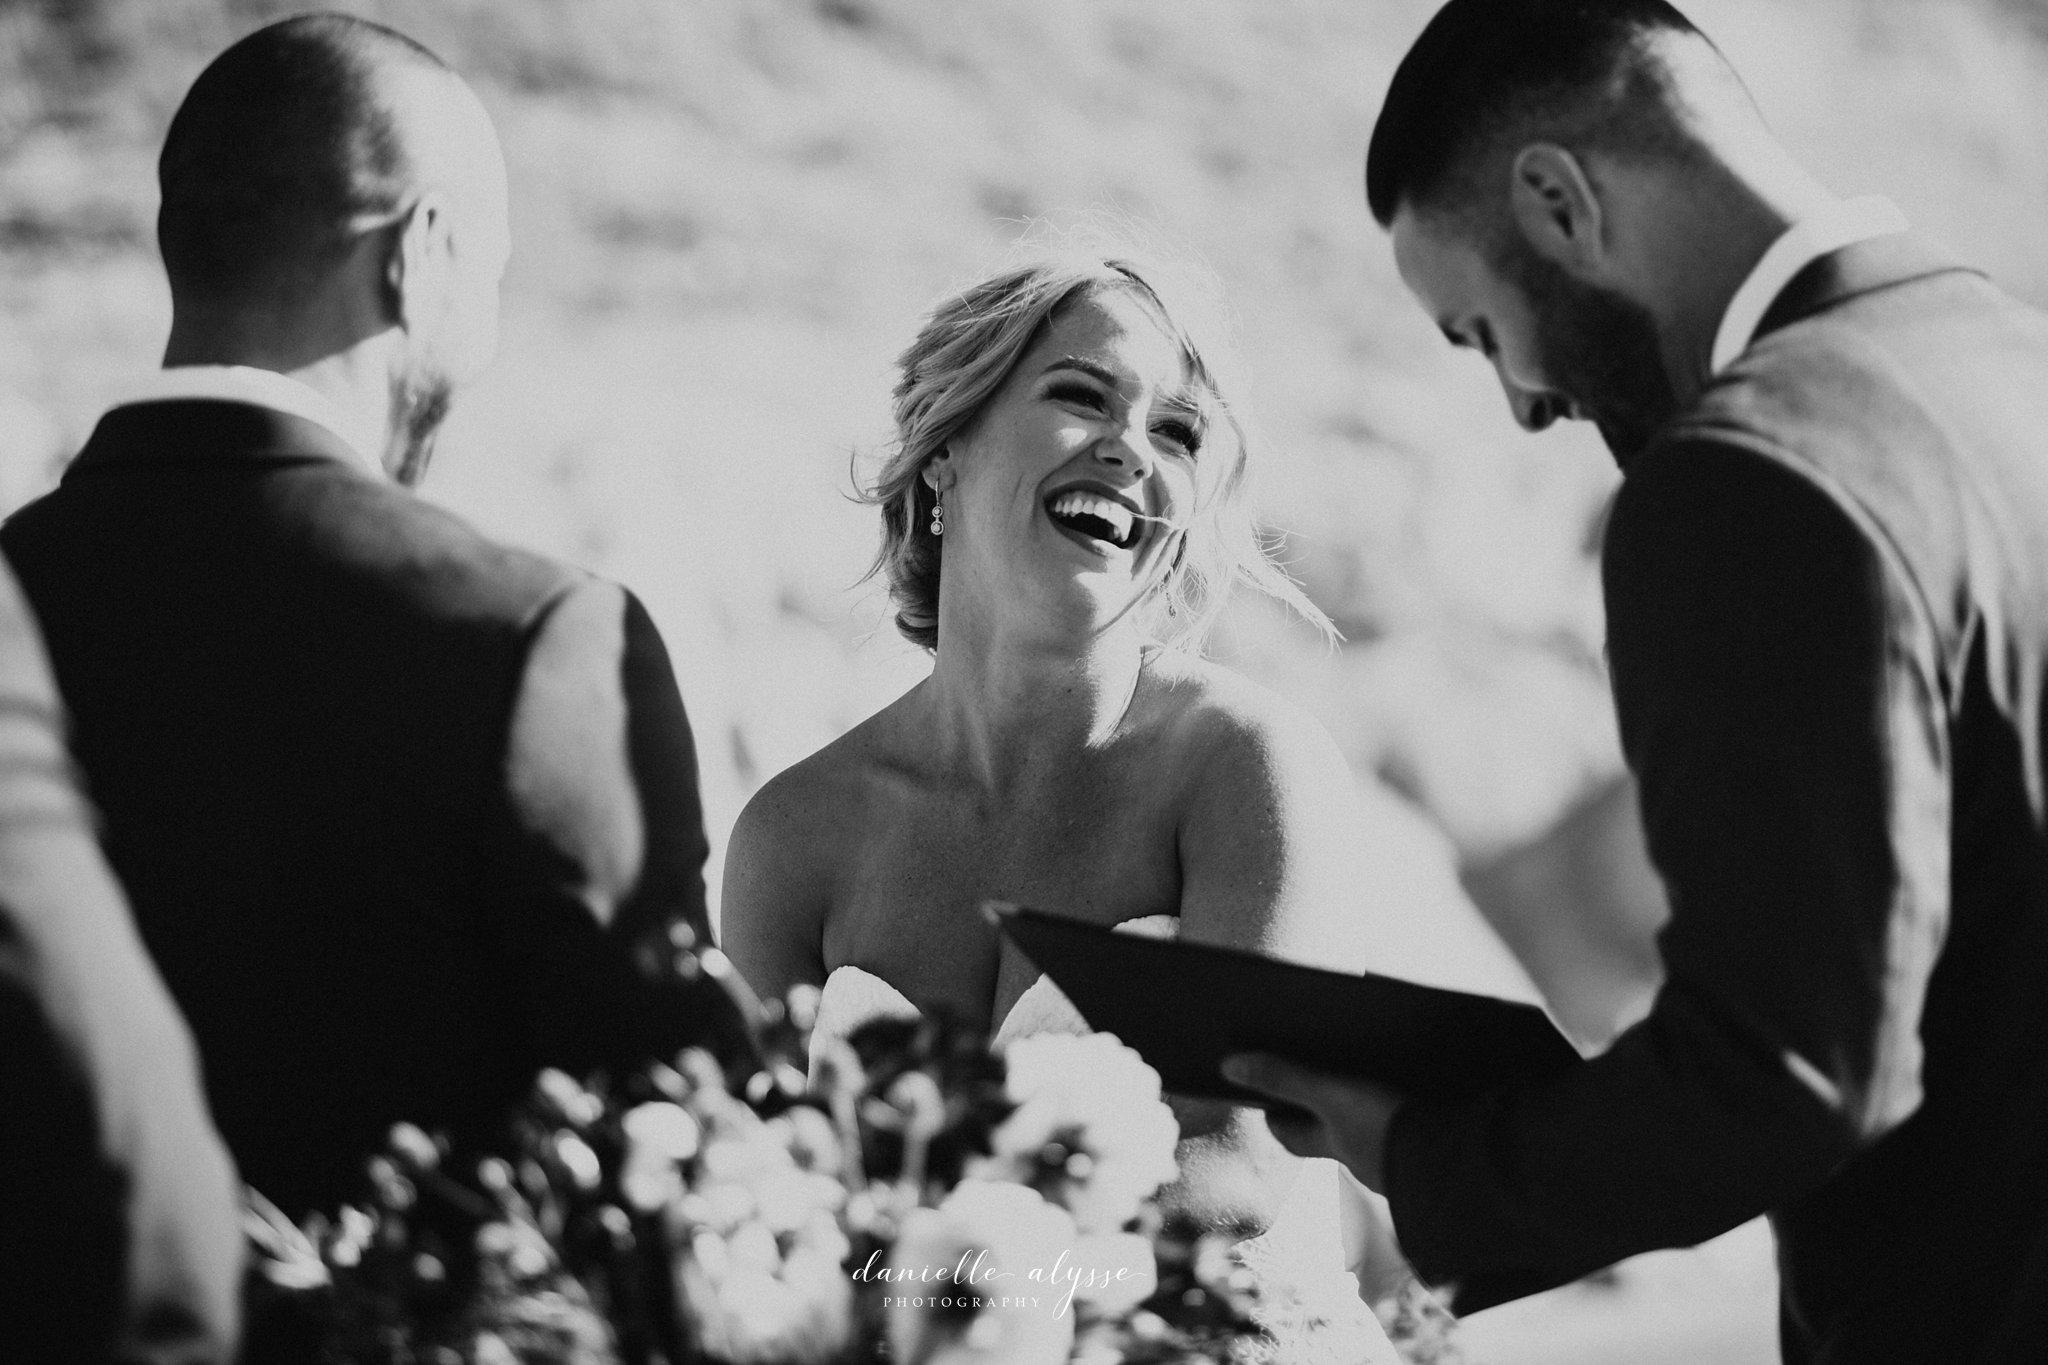 180831_wedding_stephanie_heavenly_south_lake_tahoe_danielle_alysse_photography_destination_blog_678_WEB.jpg